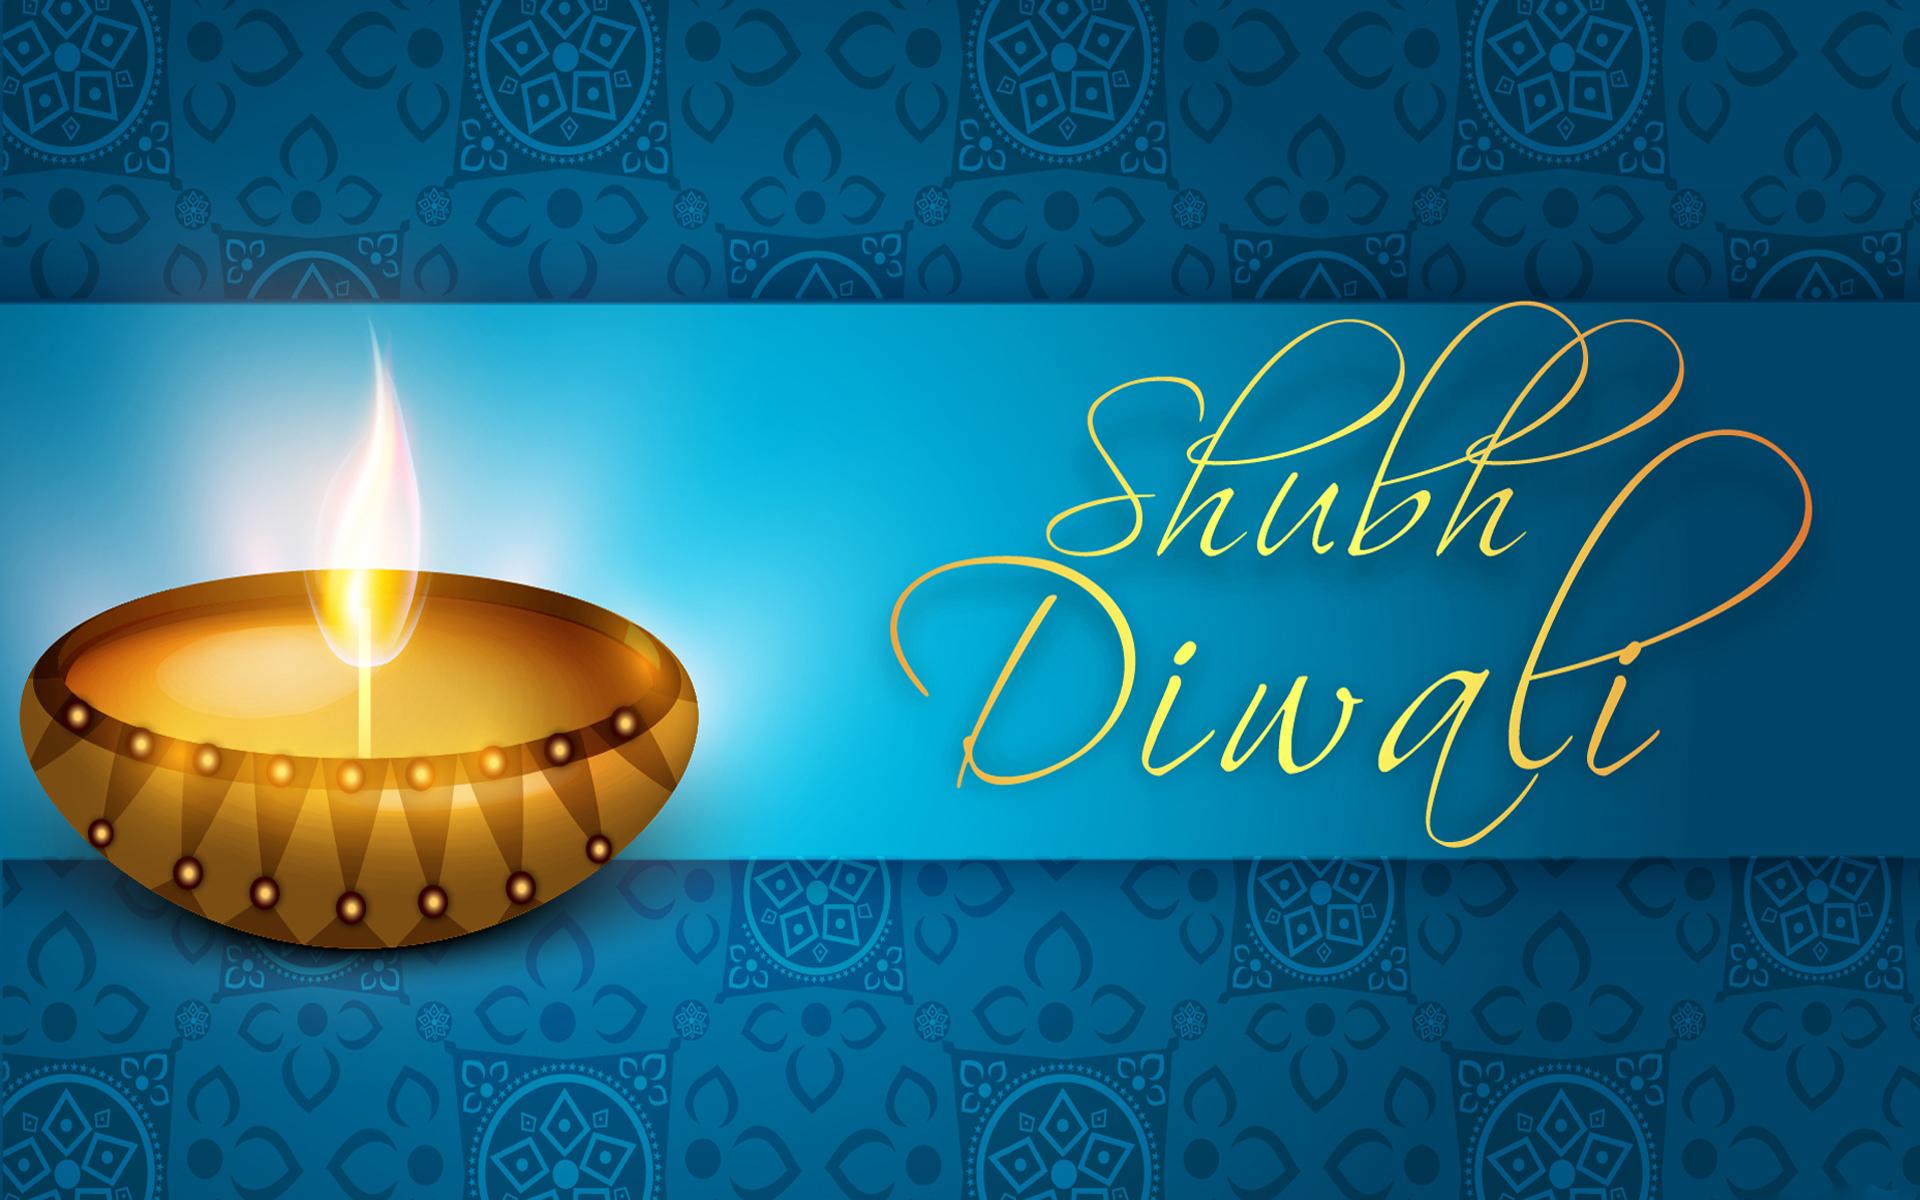 Depawali Advance SMS Wishes Pics Download